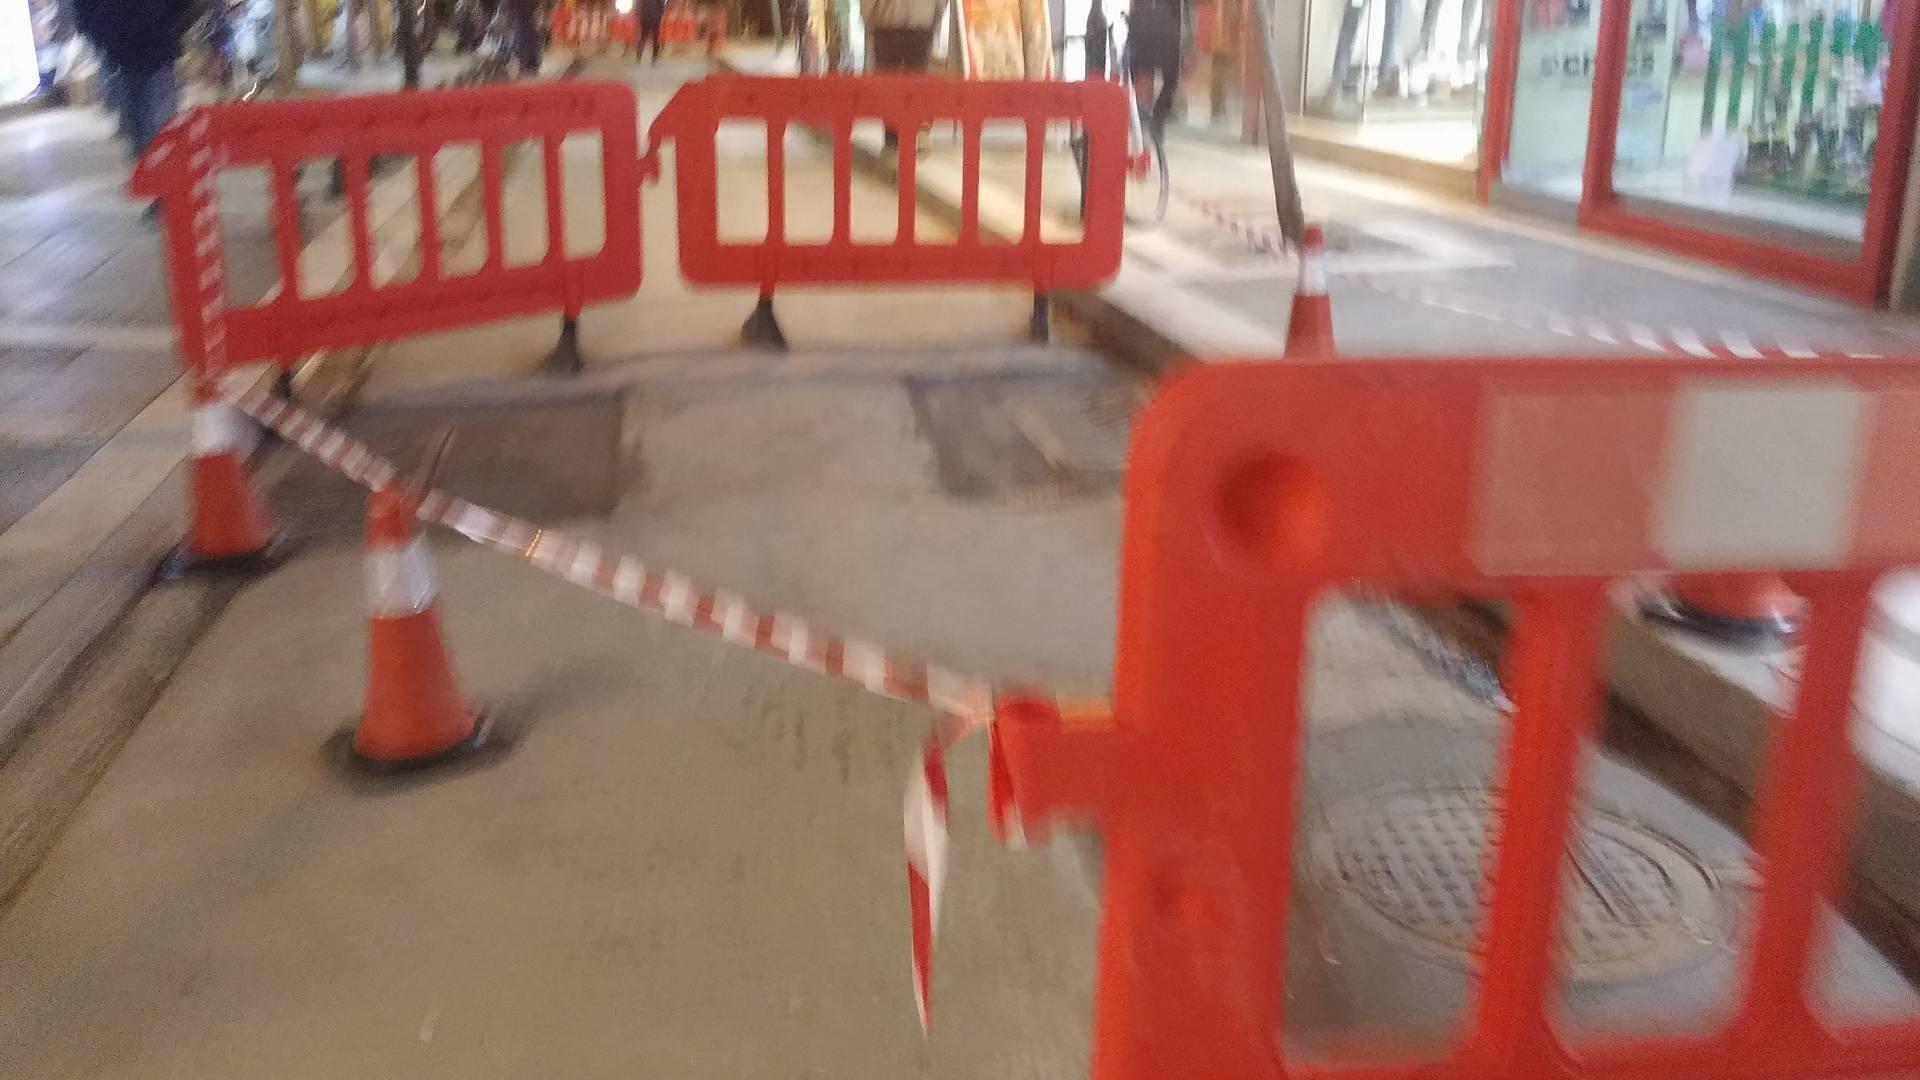 kozan.gr: Συνεχίζεται η συντήρηση φρεατίων, στις οδούς Βασιλέως Κωνσταντίνου & Noσοκομείου, στην πόλη της Πτολεμαΐδας (Φωτογραφίες)